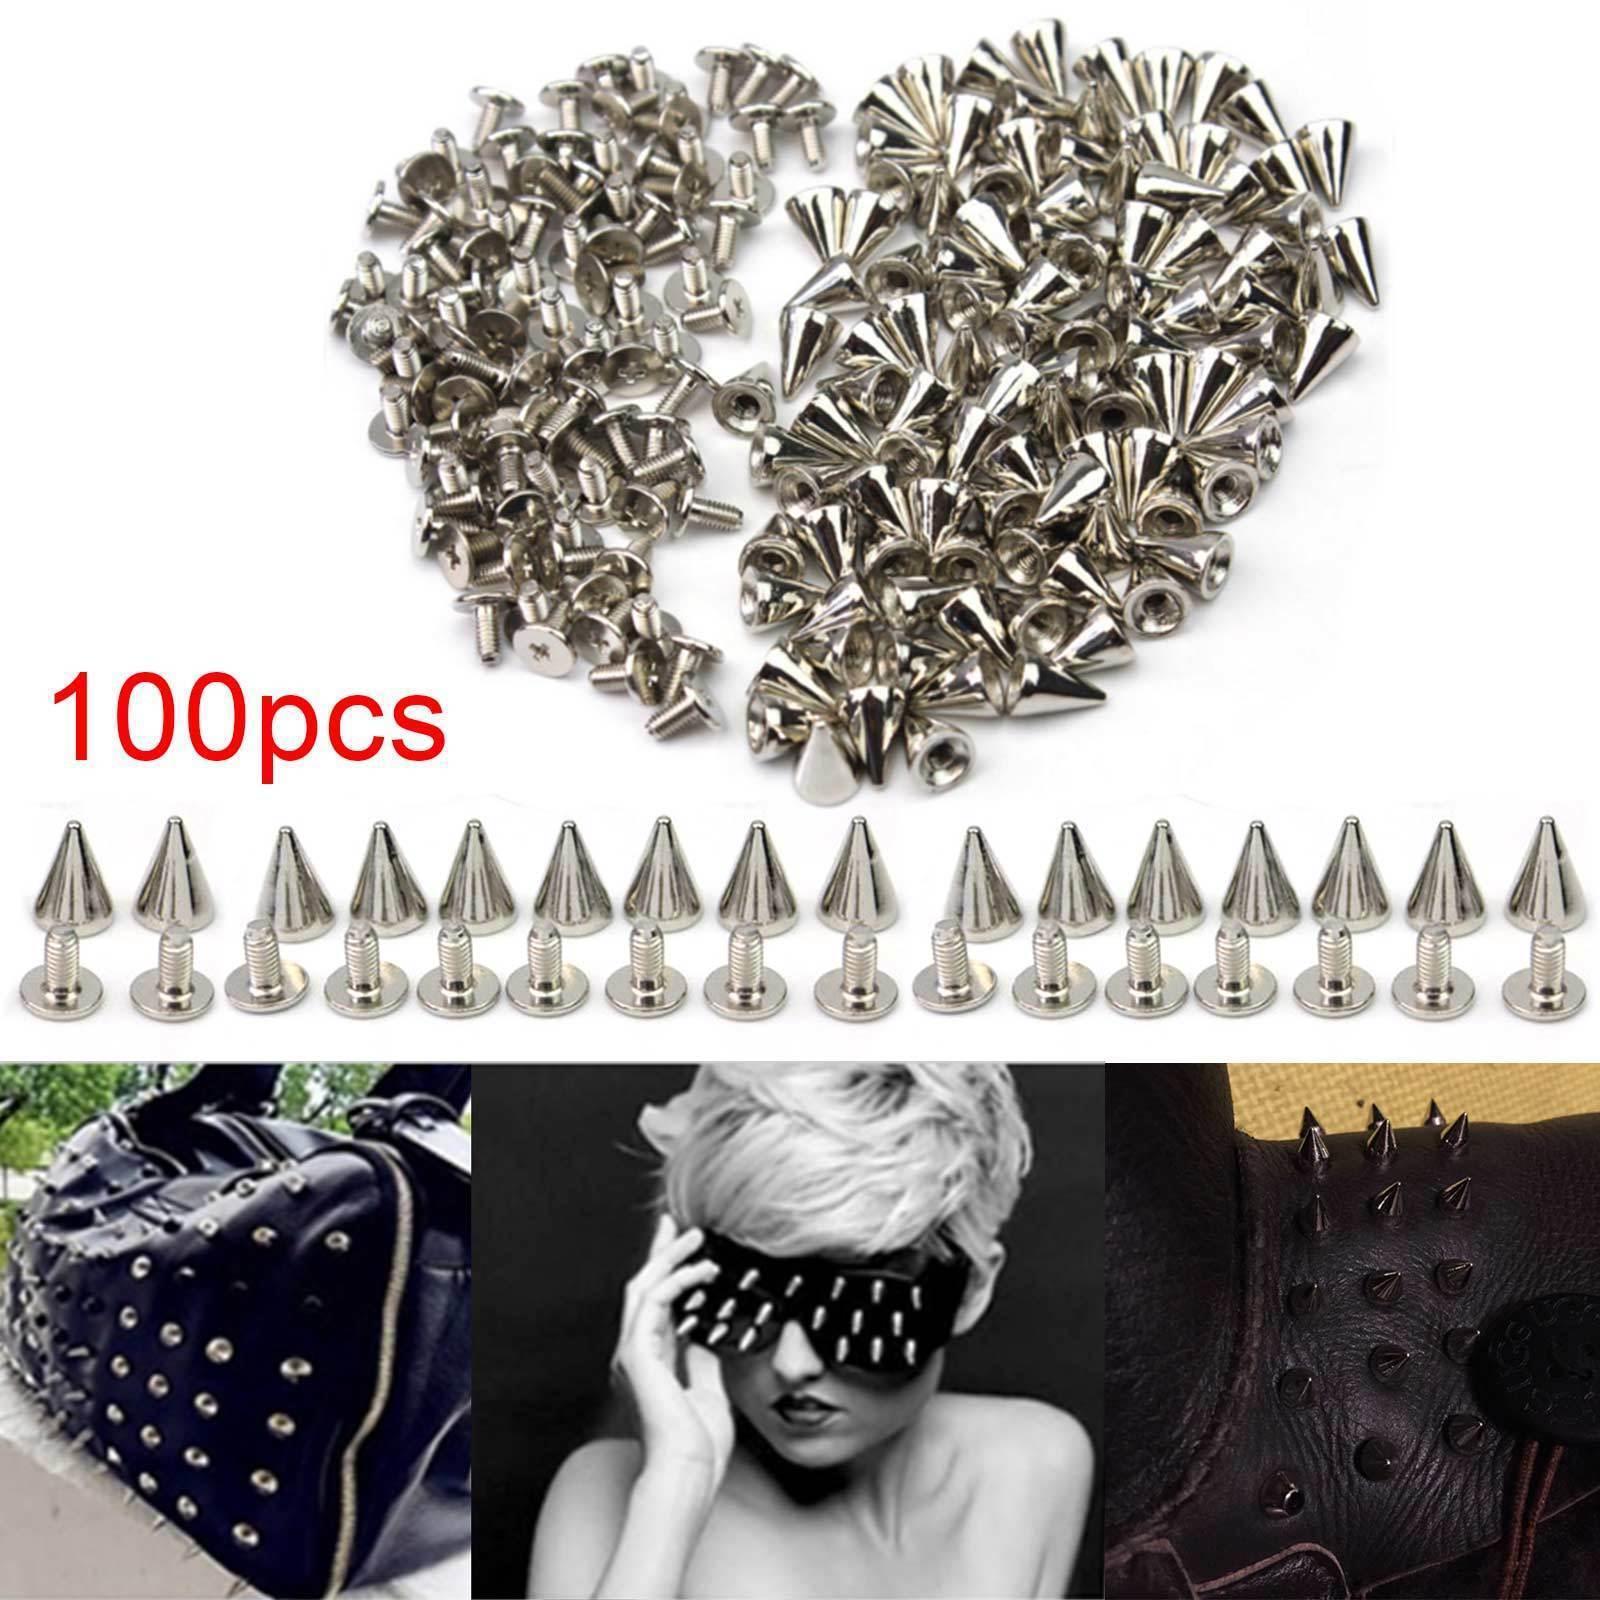 100 x Metallic Punk Round Conical Studs DIY Leathercraft Accessory Silver